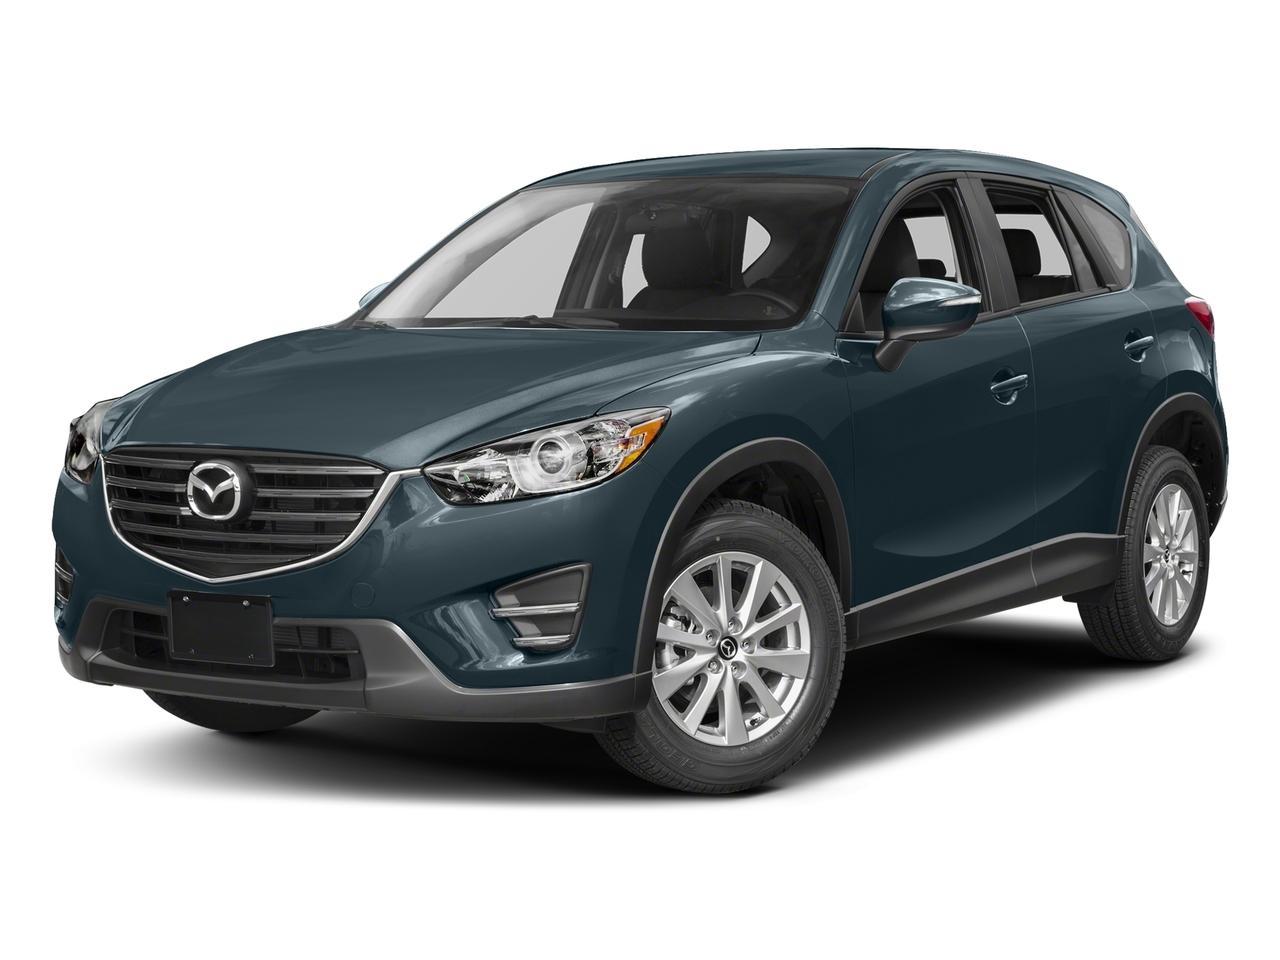 2016 Mazda CX-5 Vehicle Photo in Tucson, AZ 85712